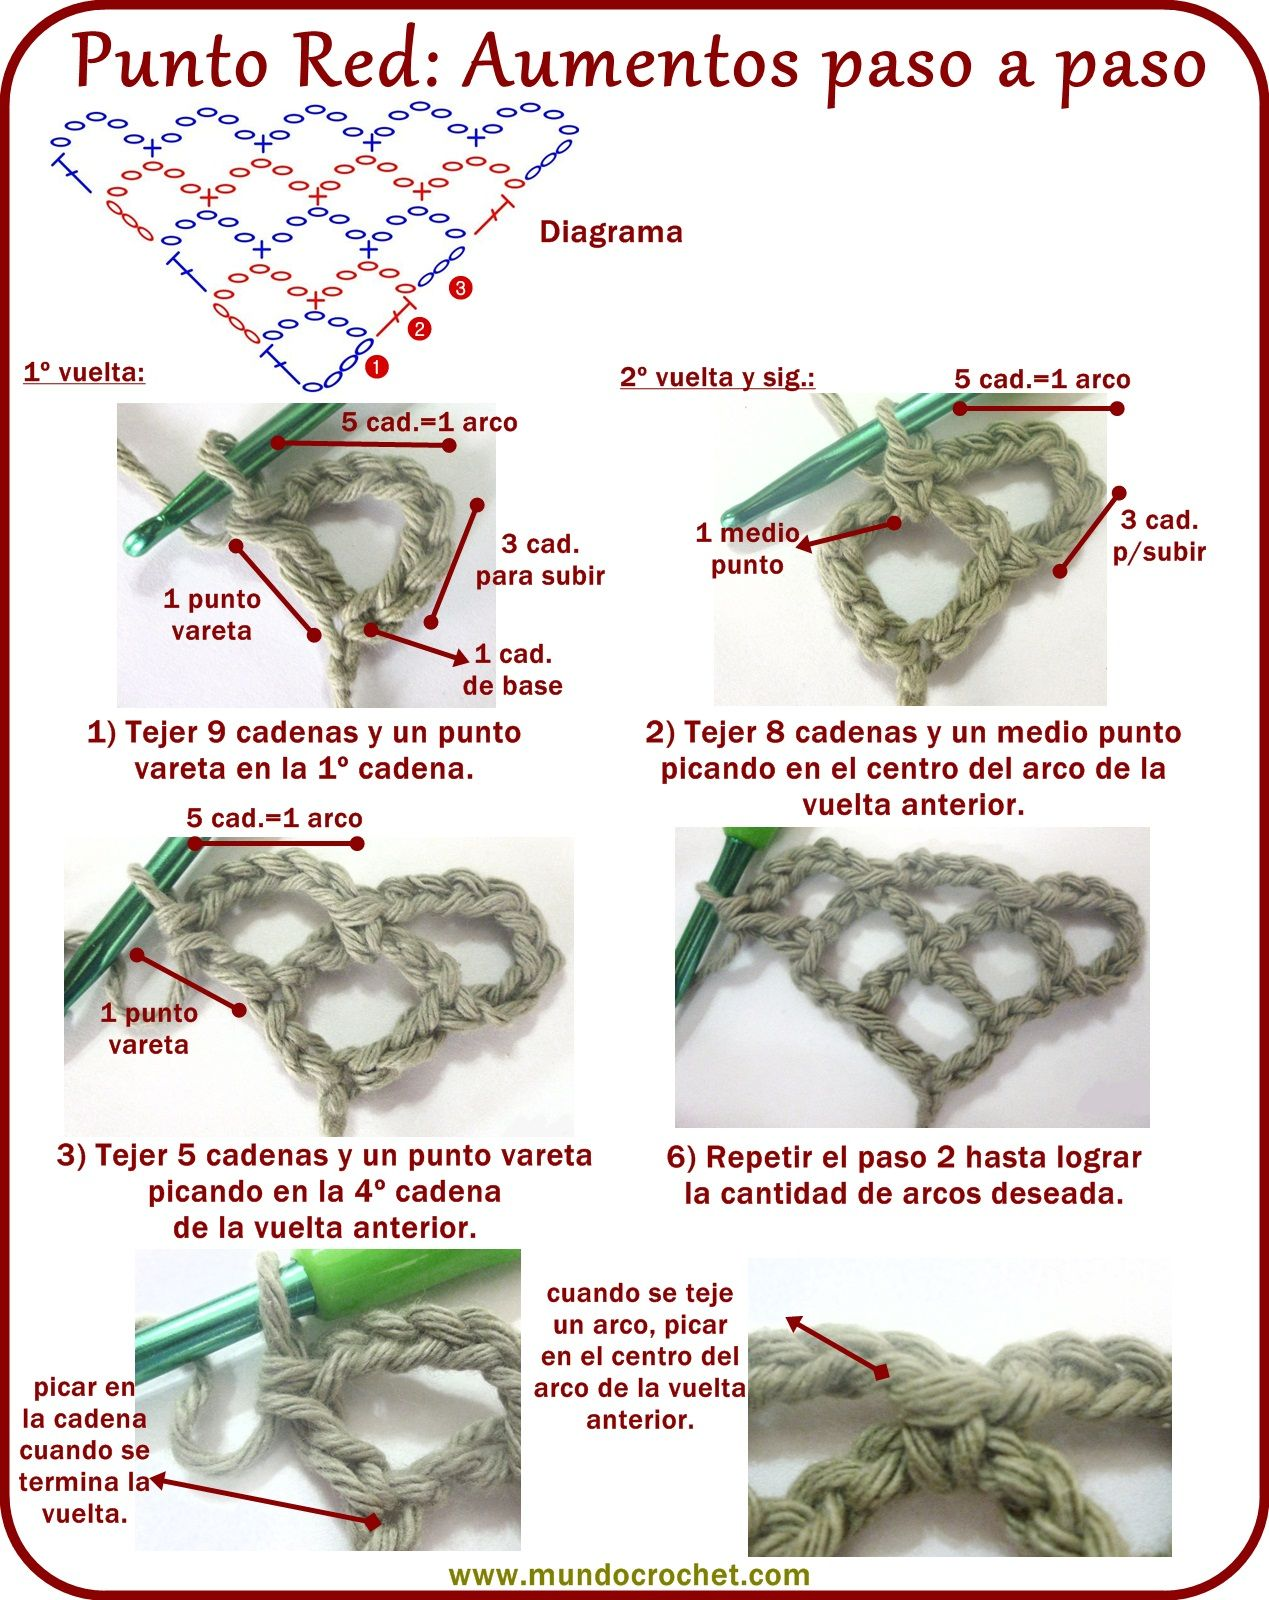 Pin by Lilo Josefina on crochet symbols and tutorials   Pinterest ...